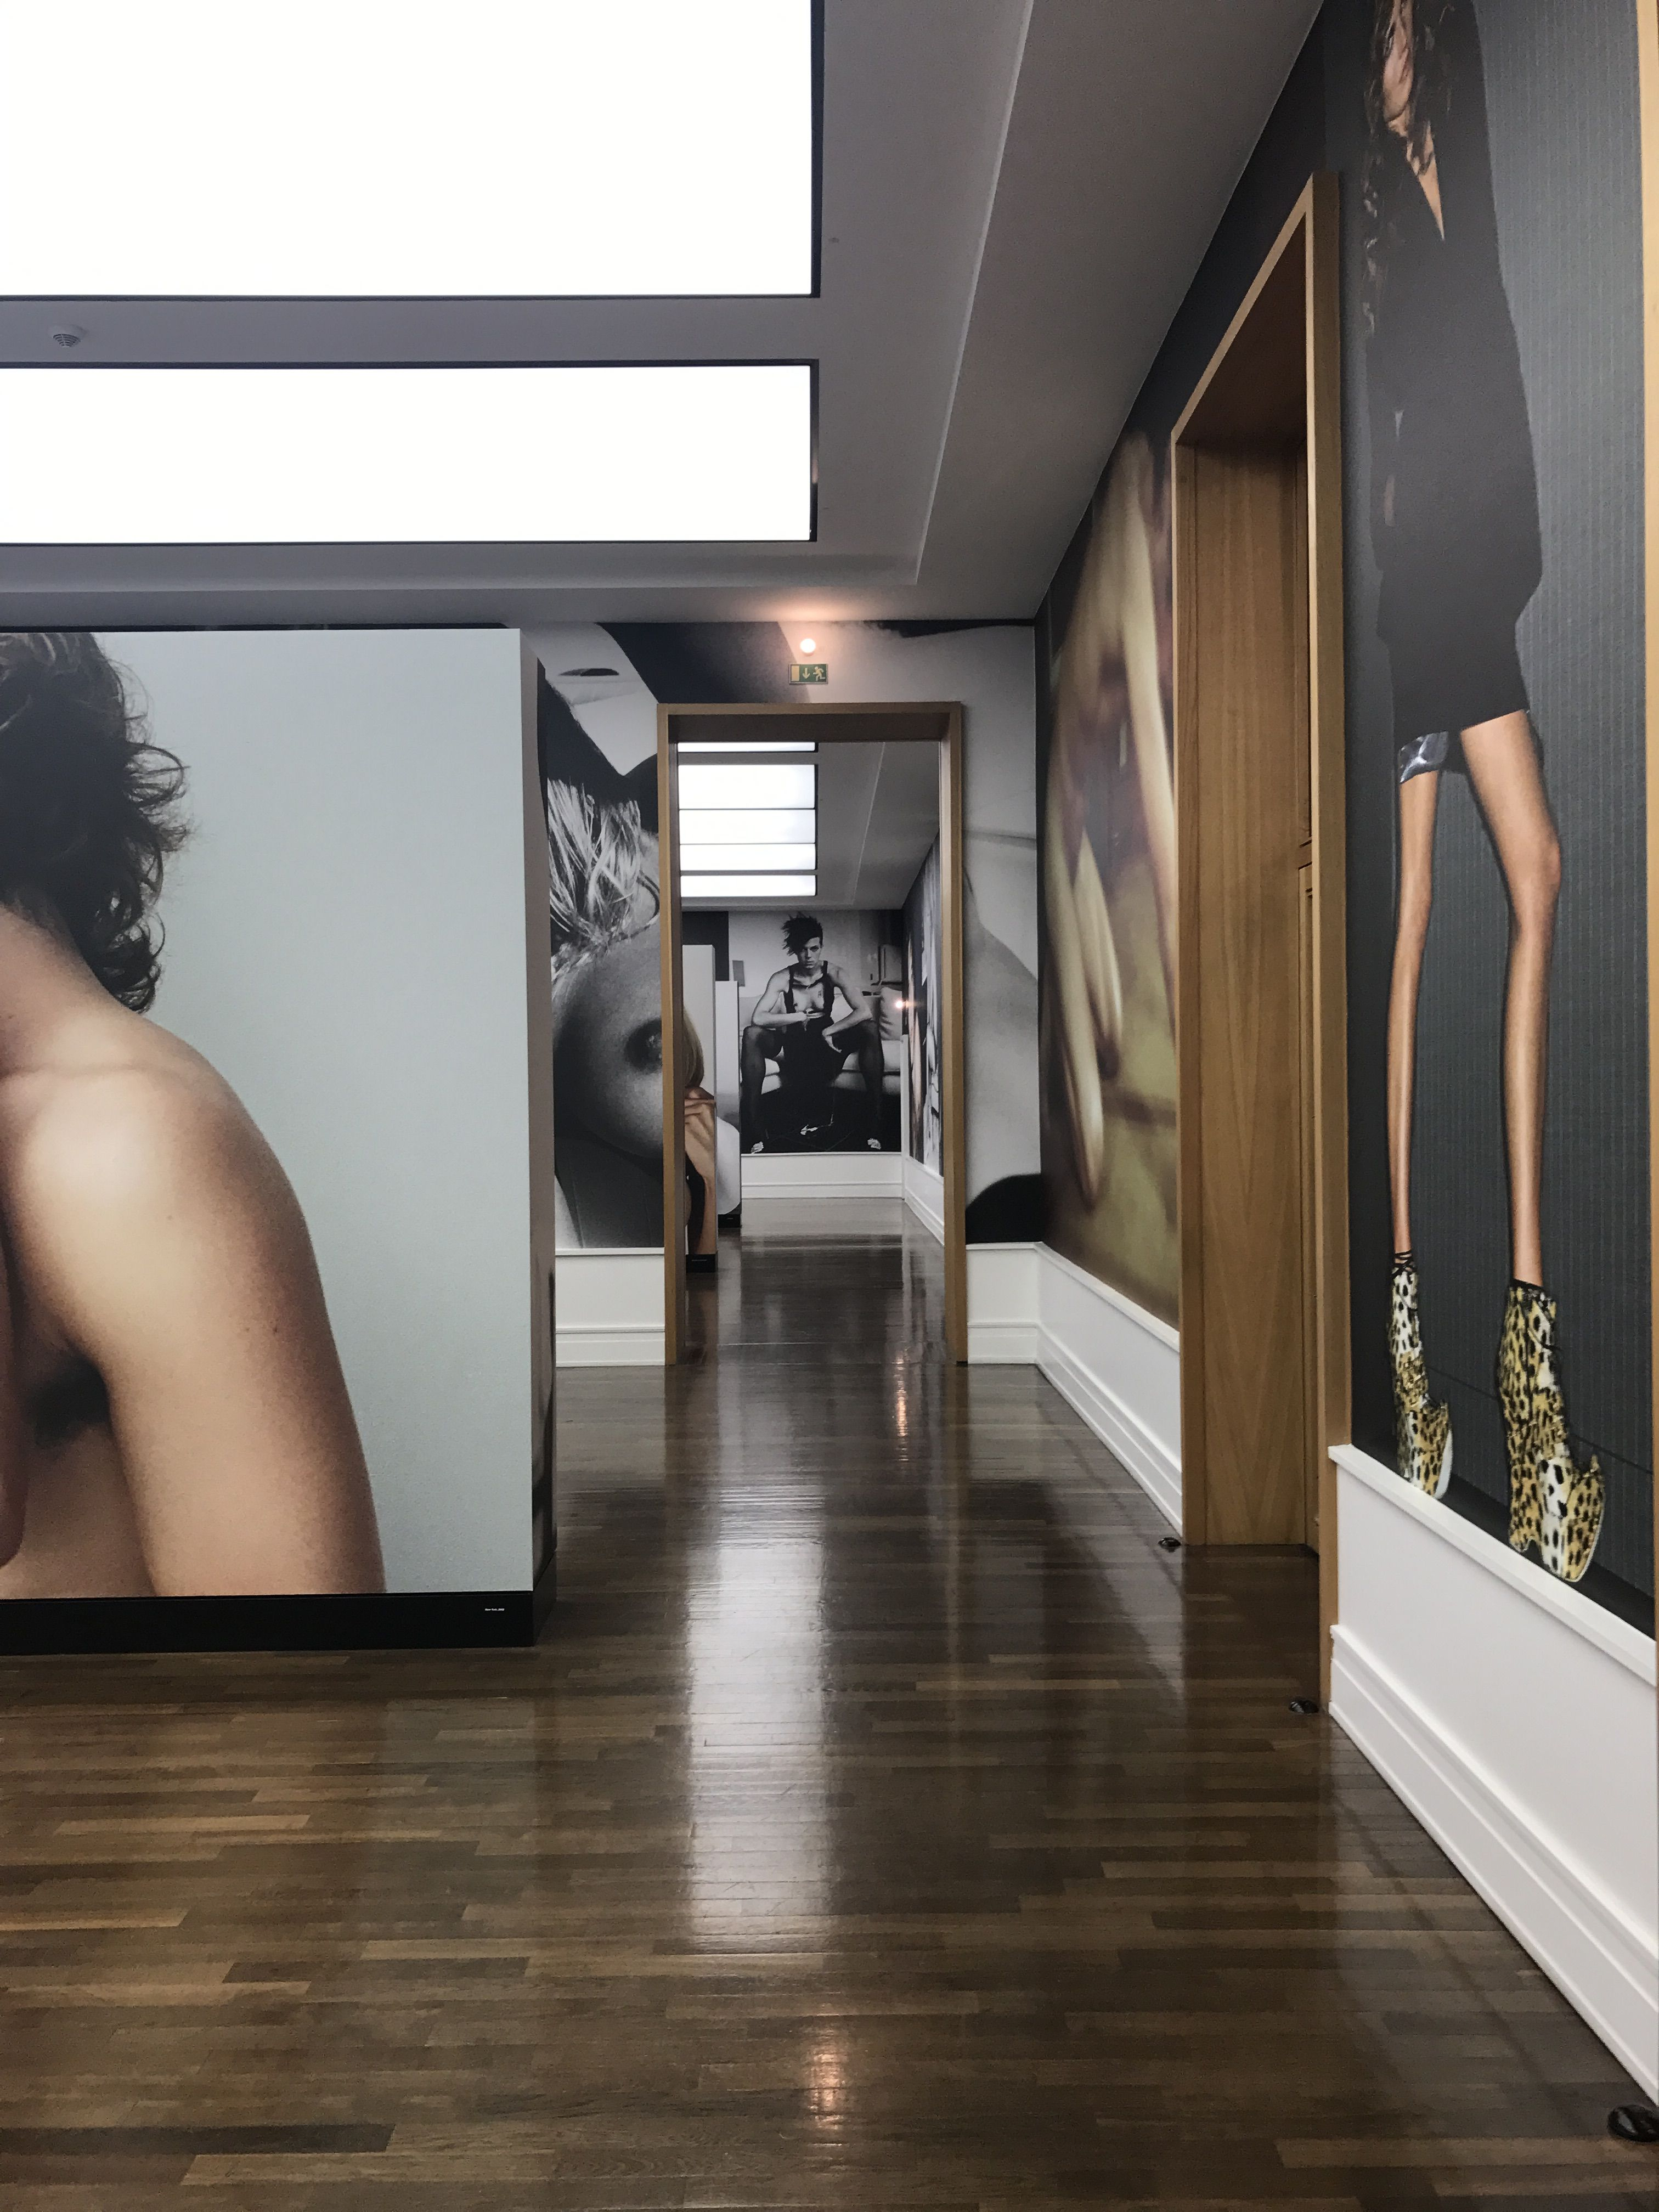 Muzeum fr fotografie/helmut newton foundation 37